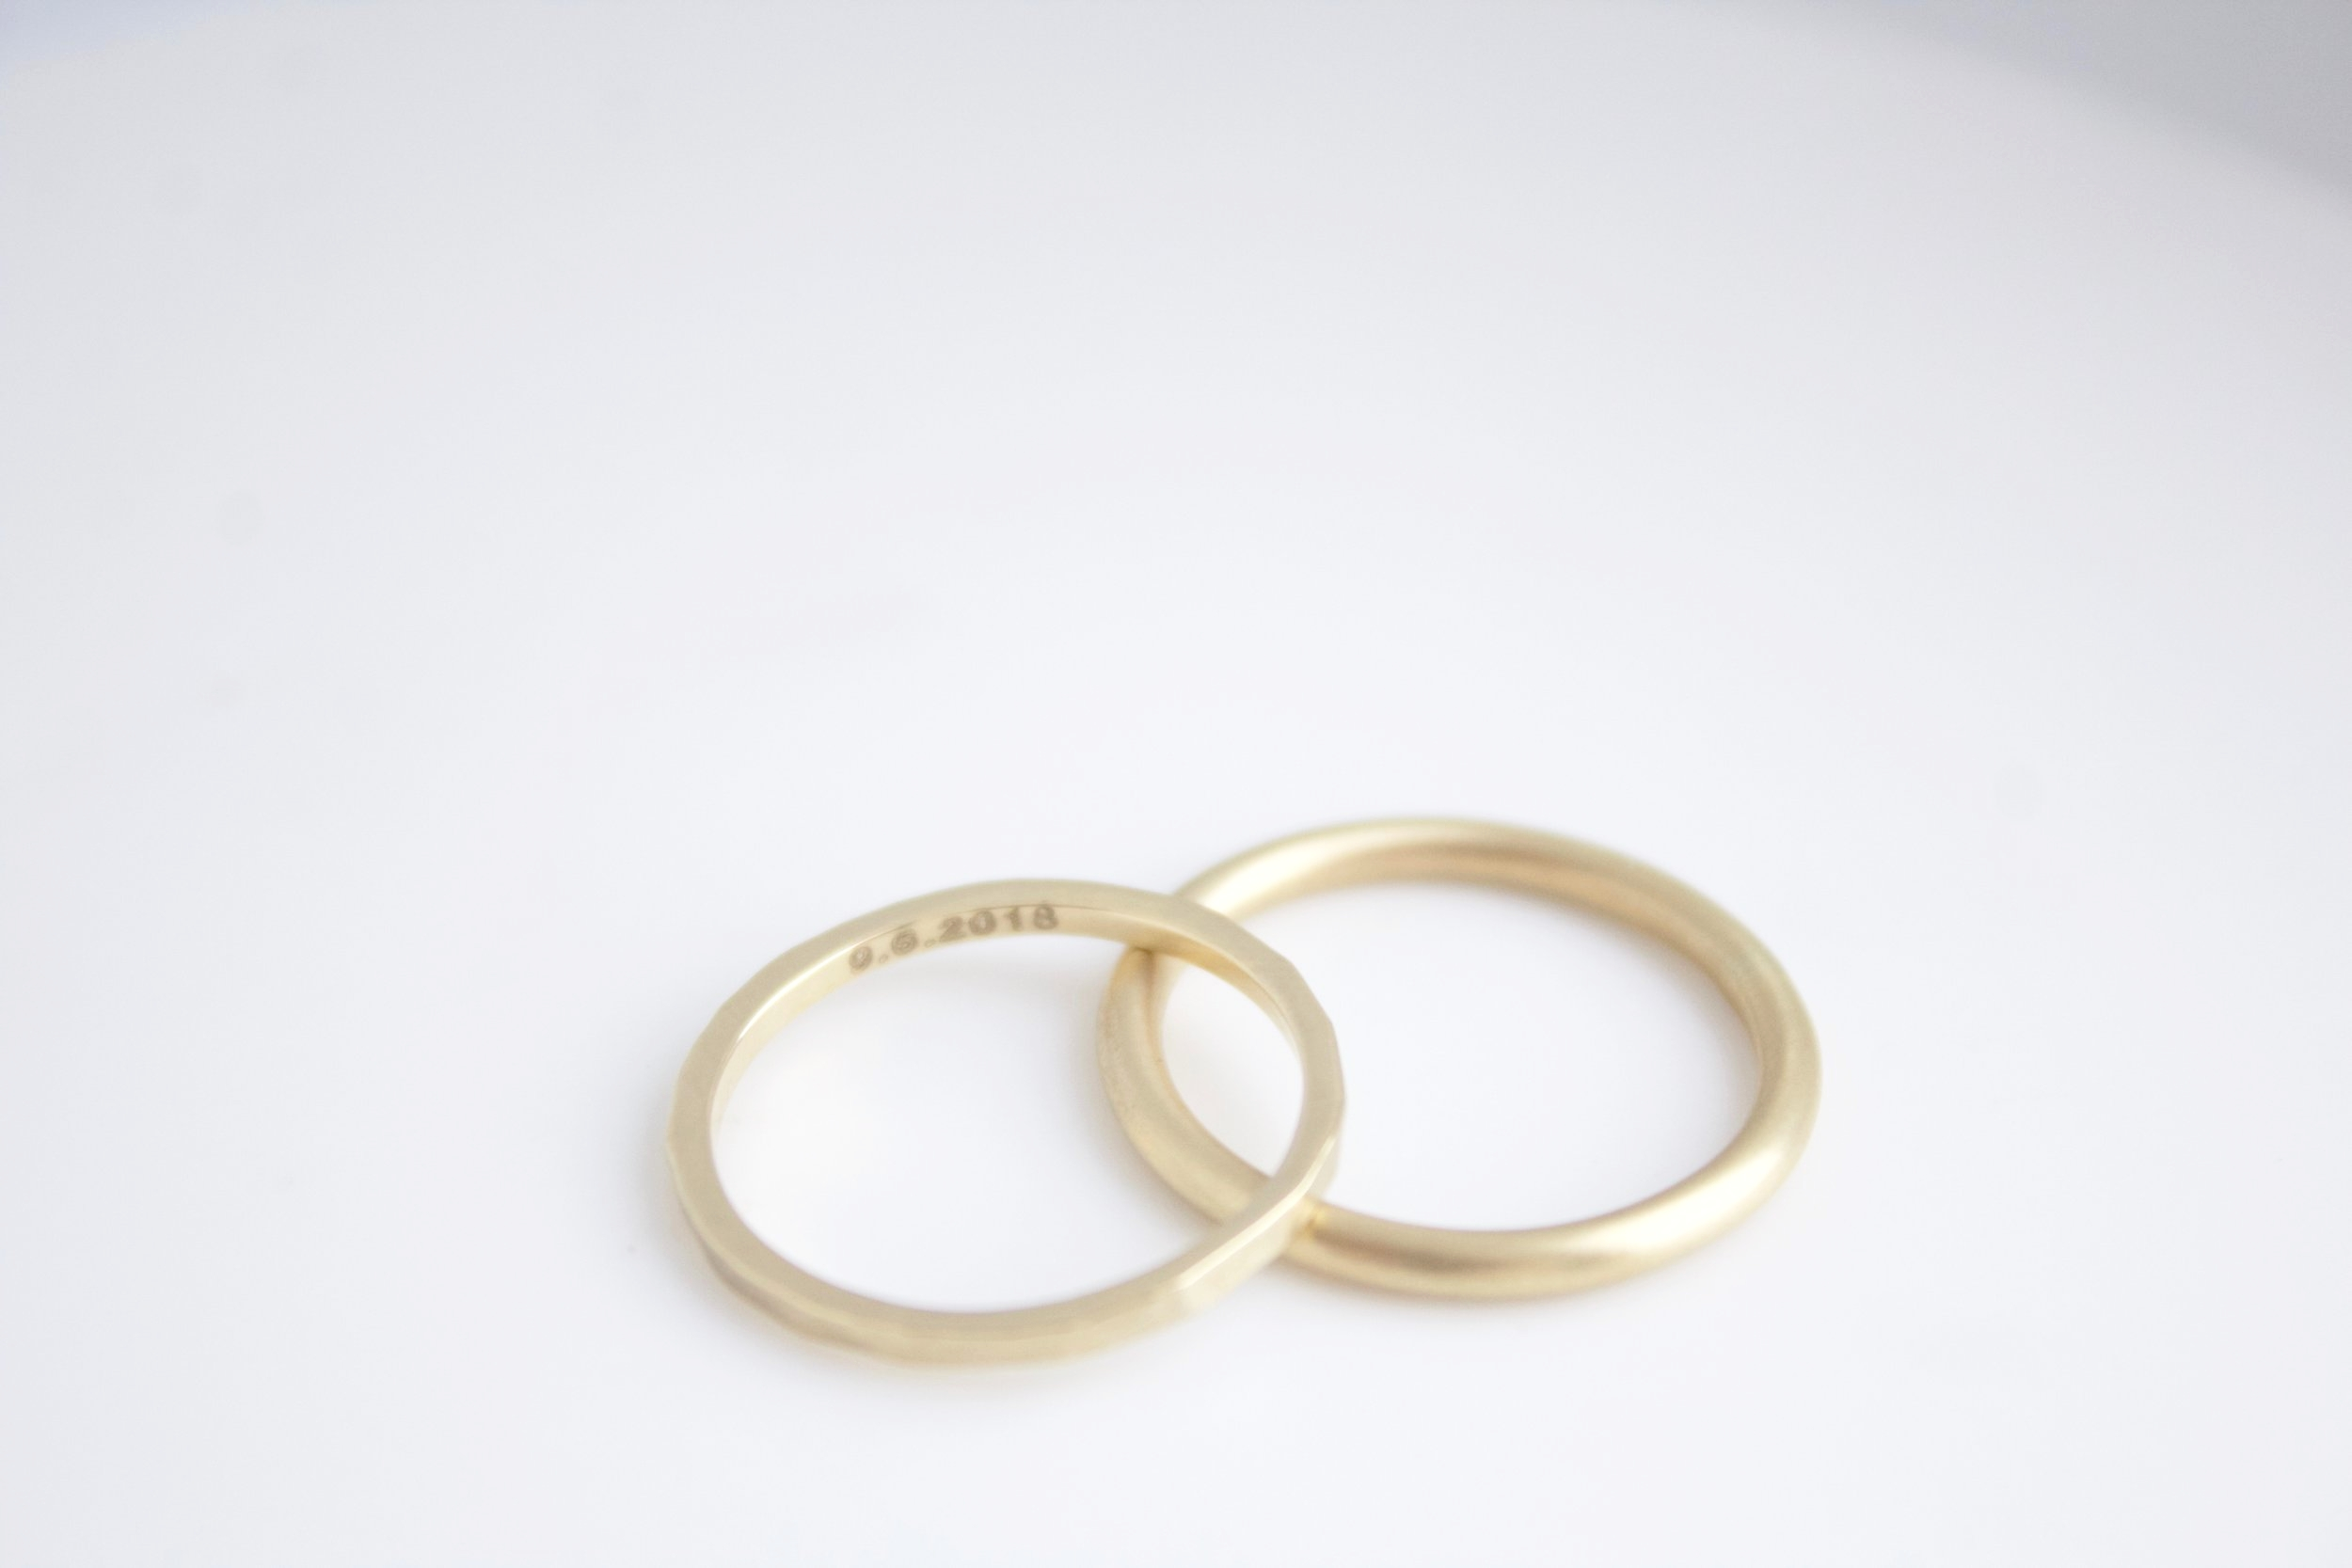 MARRIAGE - I DO